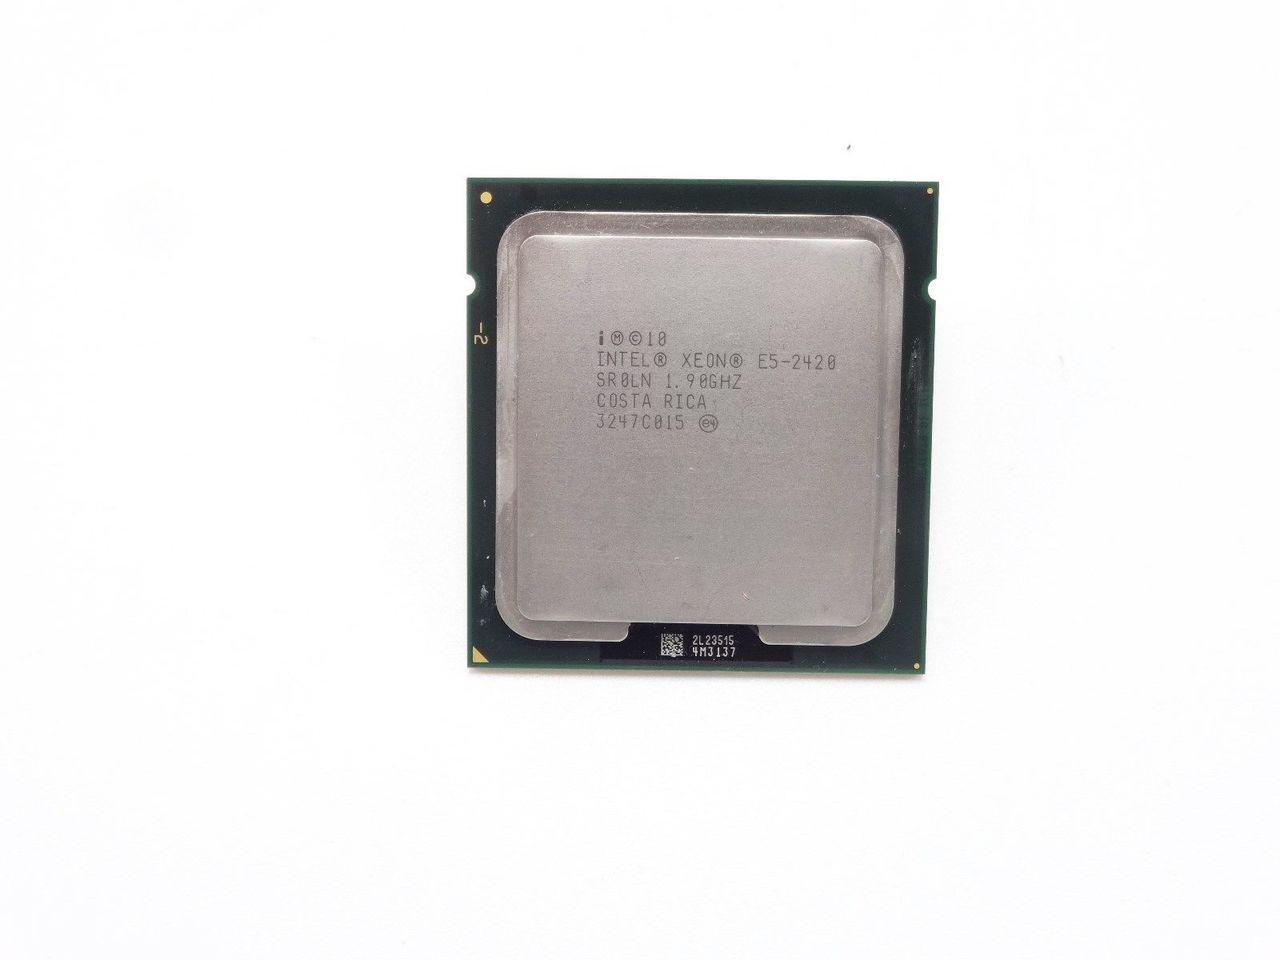 Intel Xeon SR0LN E5-2420 1.9GHZ/15MB 6core Processor